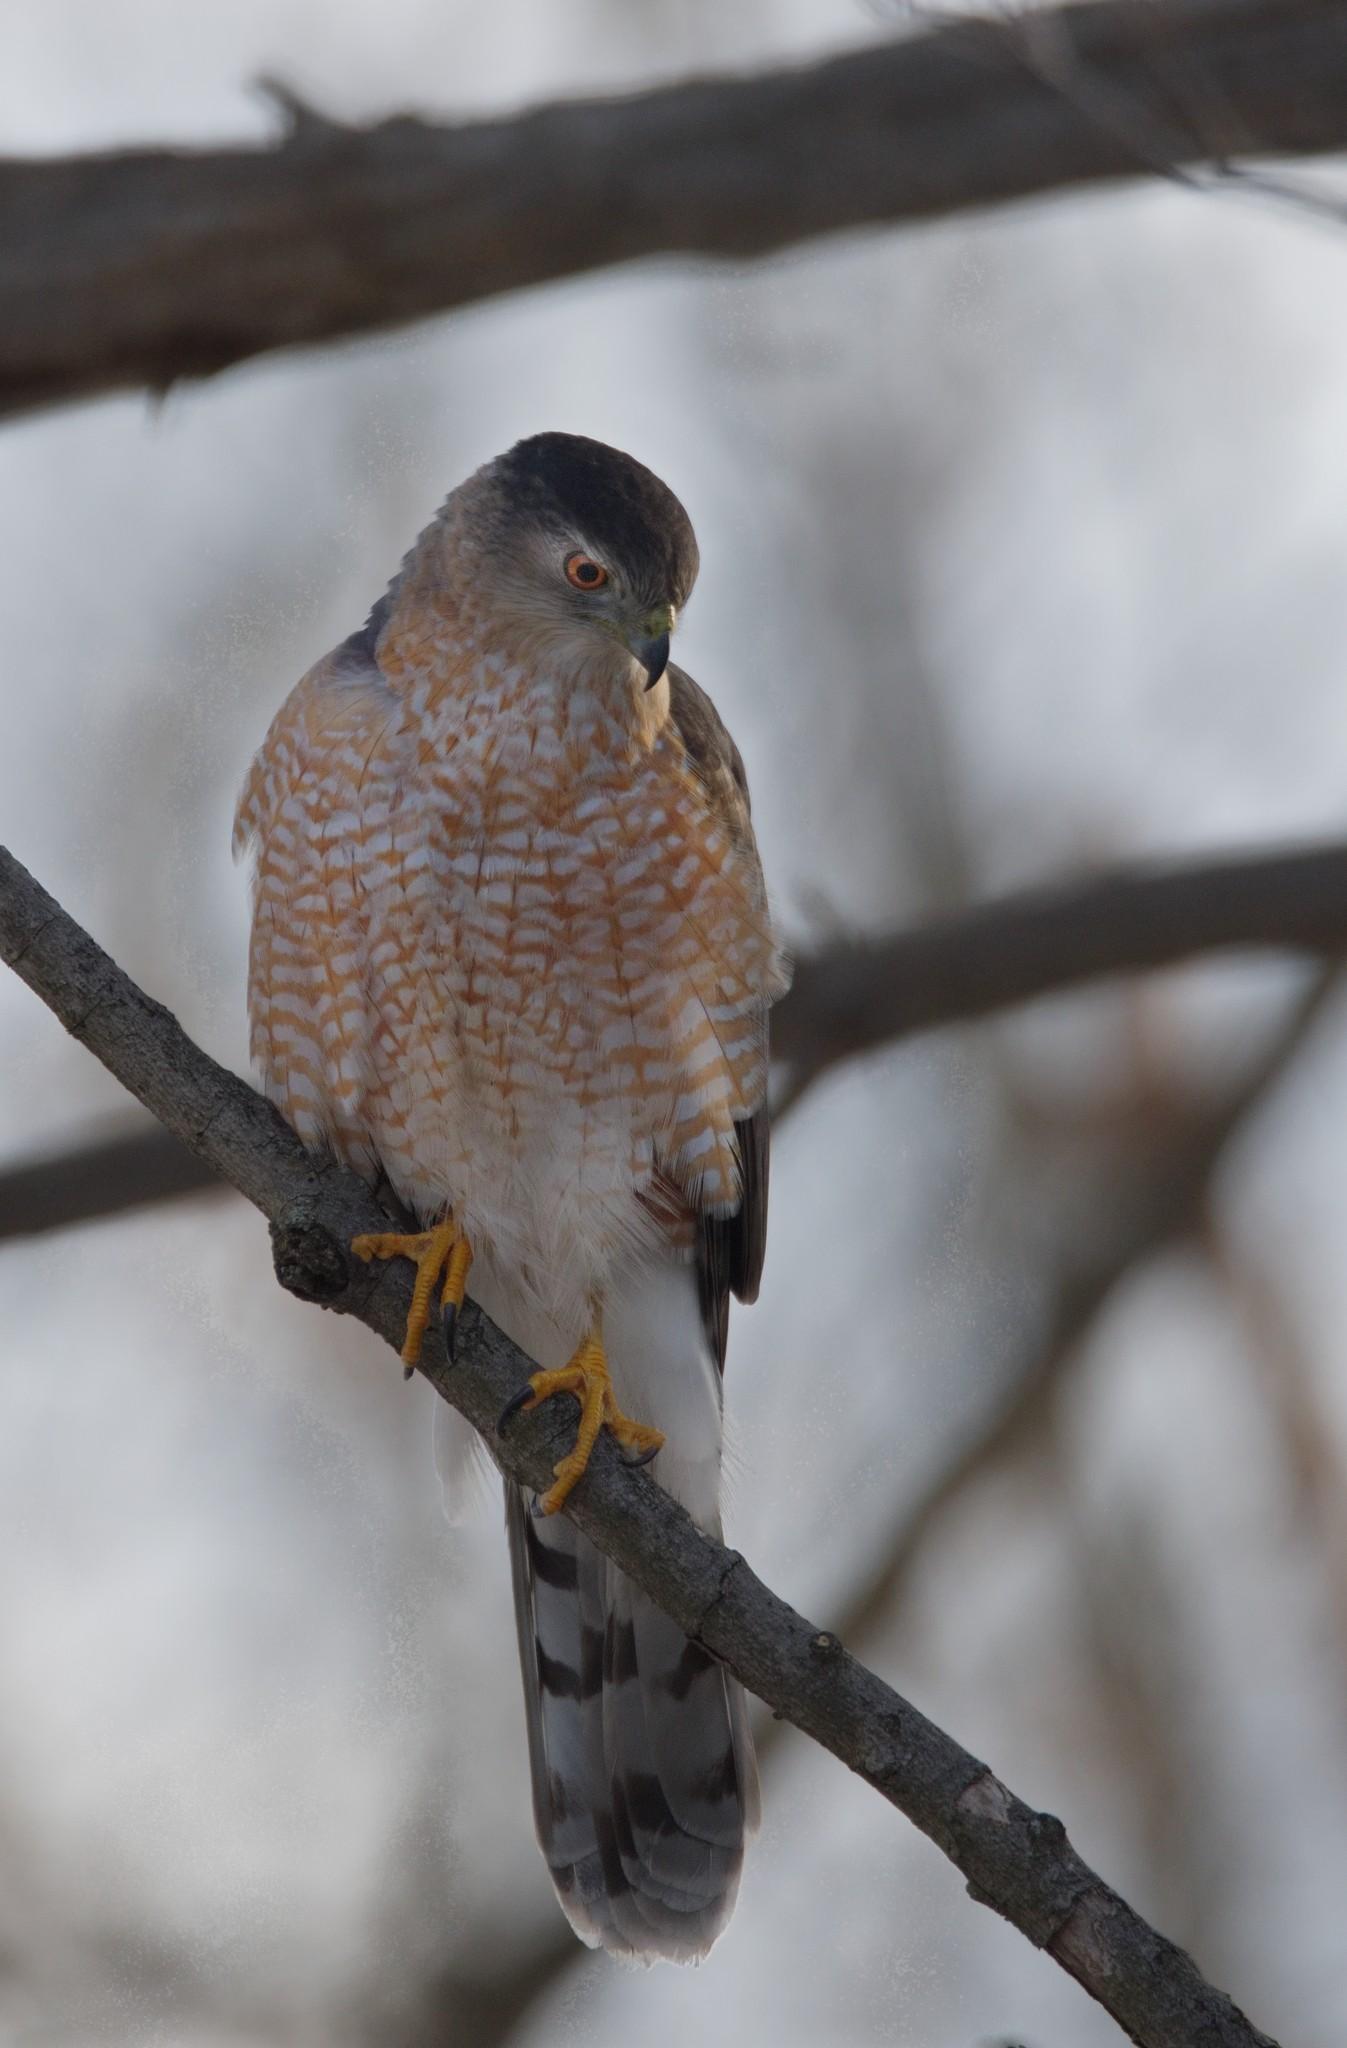 Sharp-Shinned Hawk Taken in the Wilds of Pennsylvania by Buckmaster